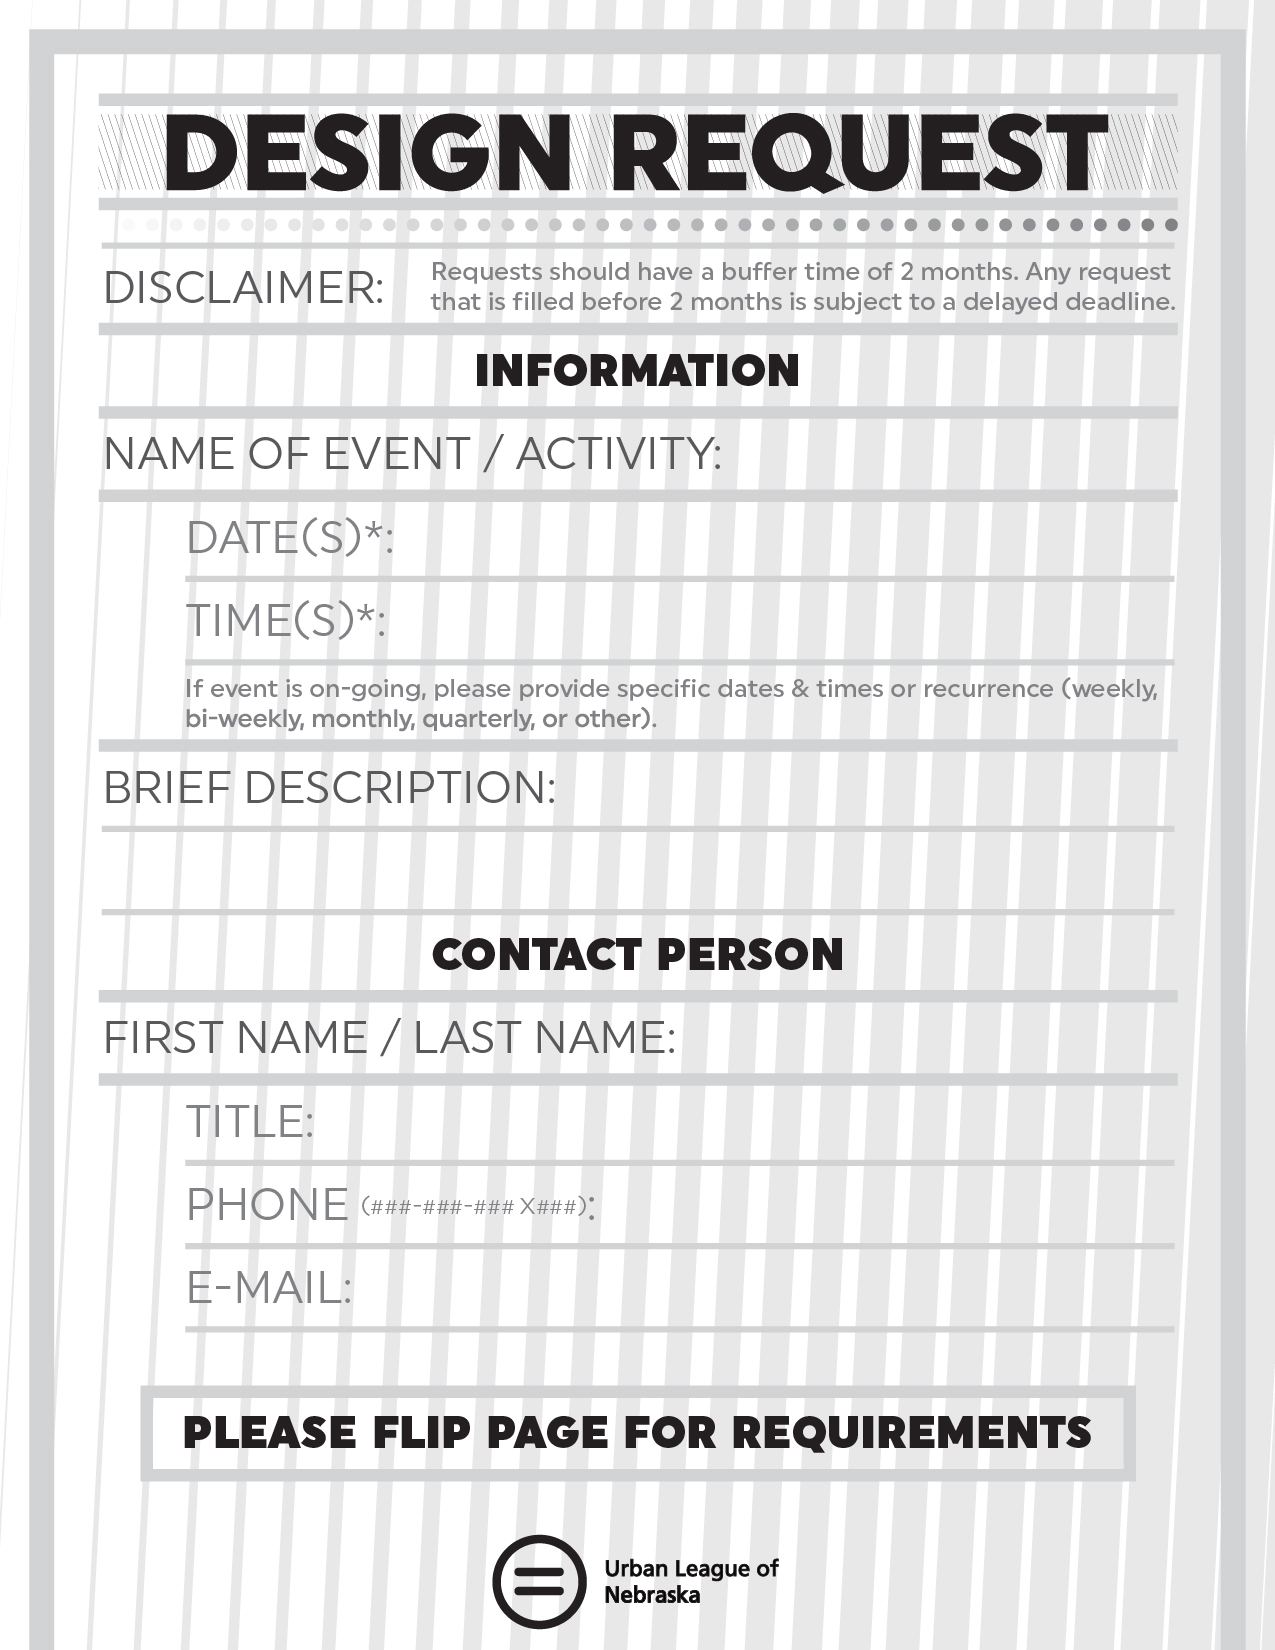 2016 ULN Design Request Form Original-01.jpg